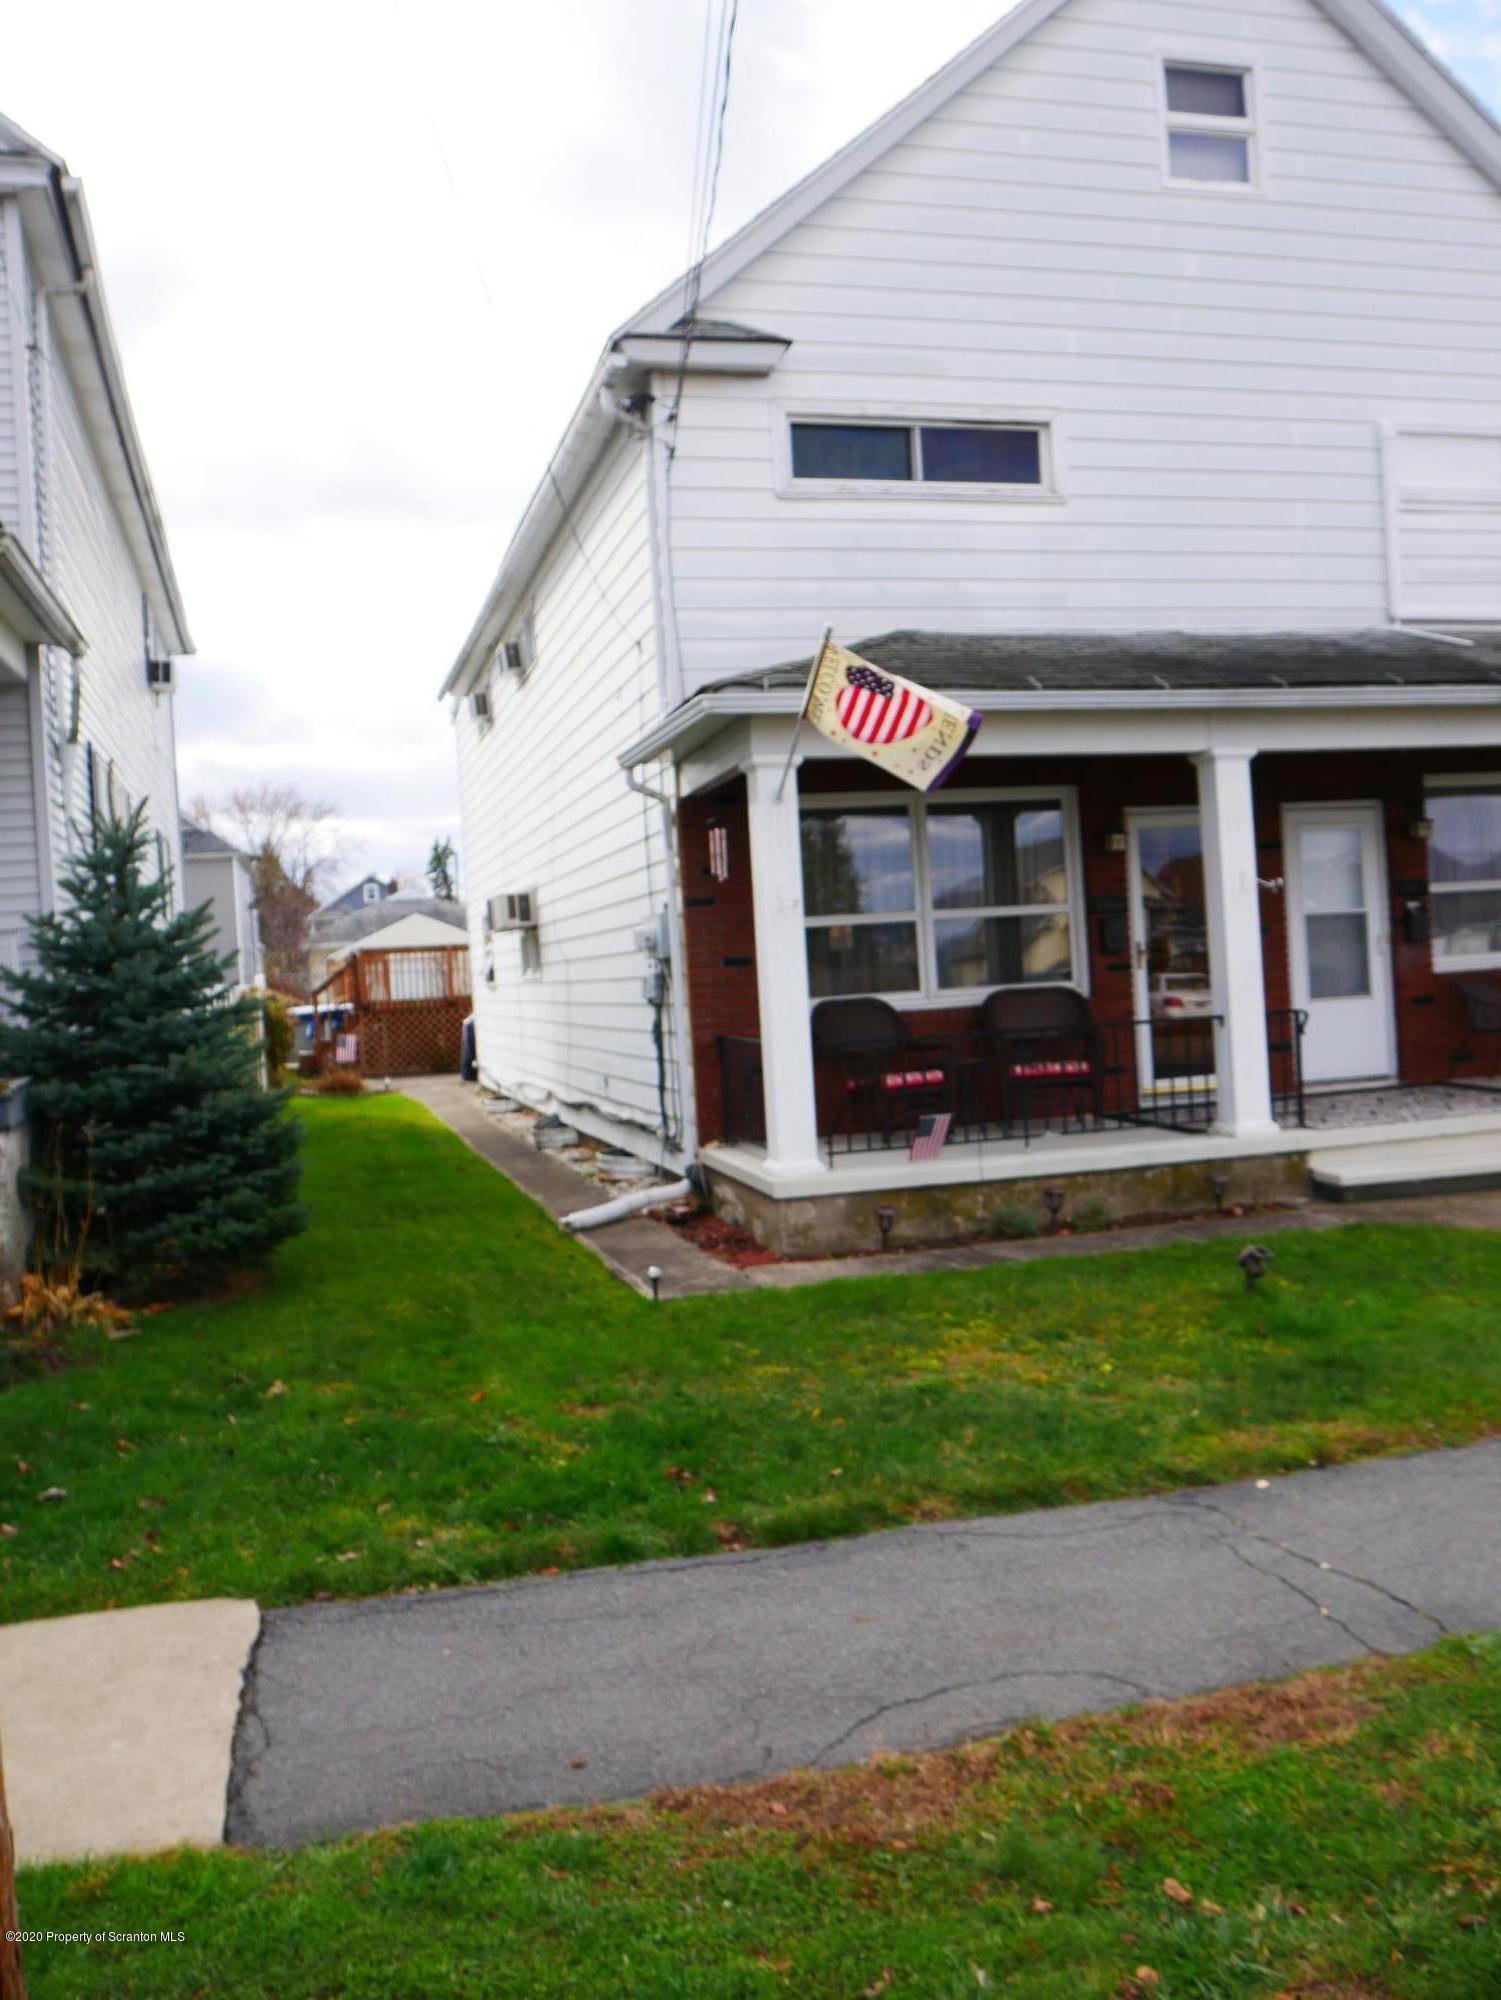 1345 Bryn Mawr St, Scranton, Pennsylvania 18504, 3 Bedrooms Bedrooms, 6 Rooms Rooms,1 BathroomBathrooms,Residential - condo/townhome,For Sale,Bryn Mawr,20-4976